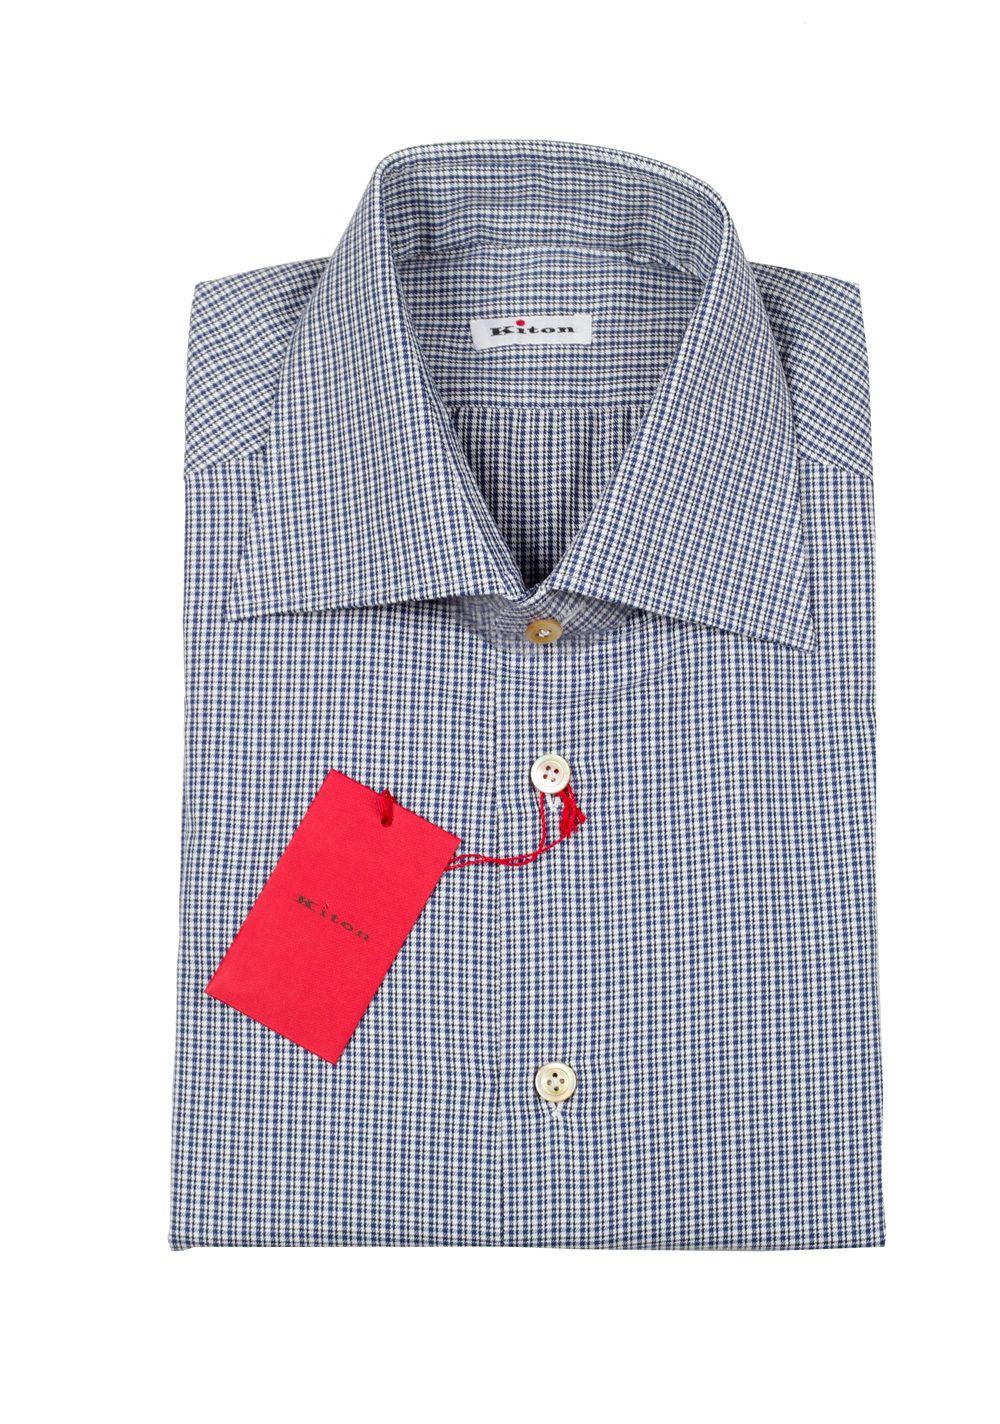 Kiton Checked White Blue Shirt Size 39 / 15,5 U.S. | Costume Limité